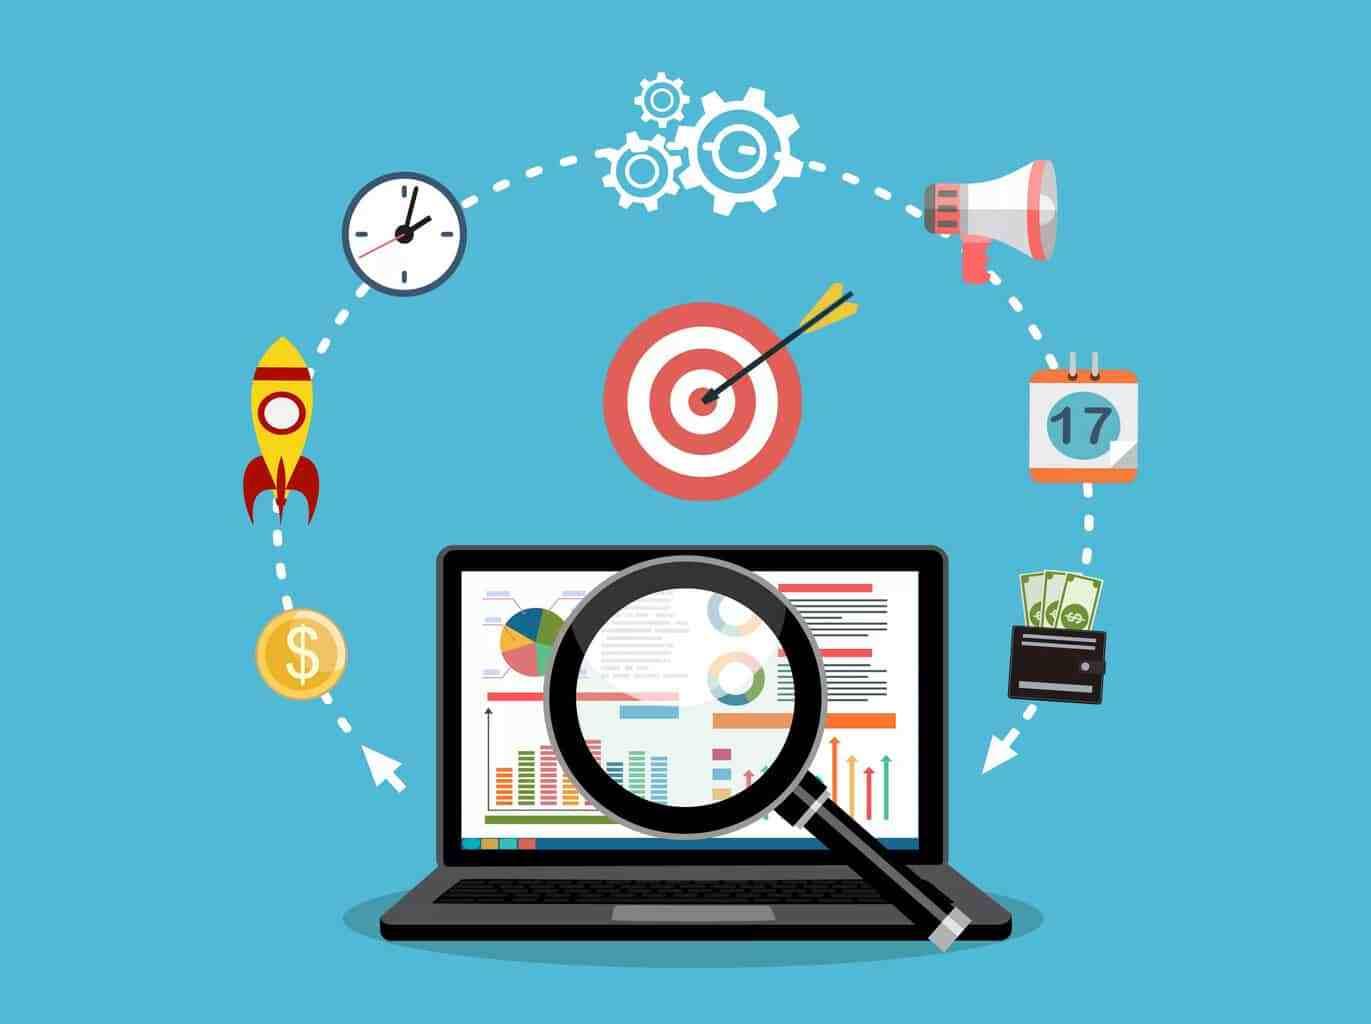 сайт как инструмент оптимизации